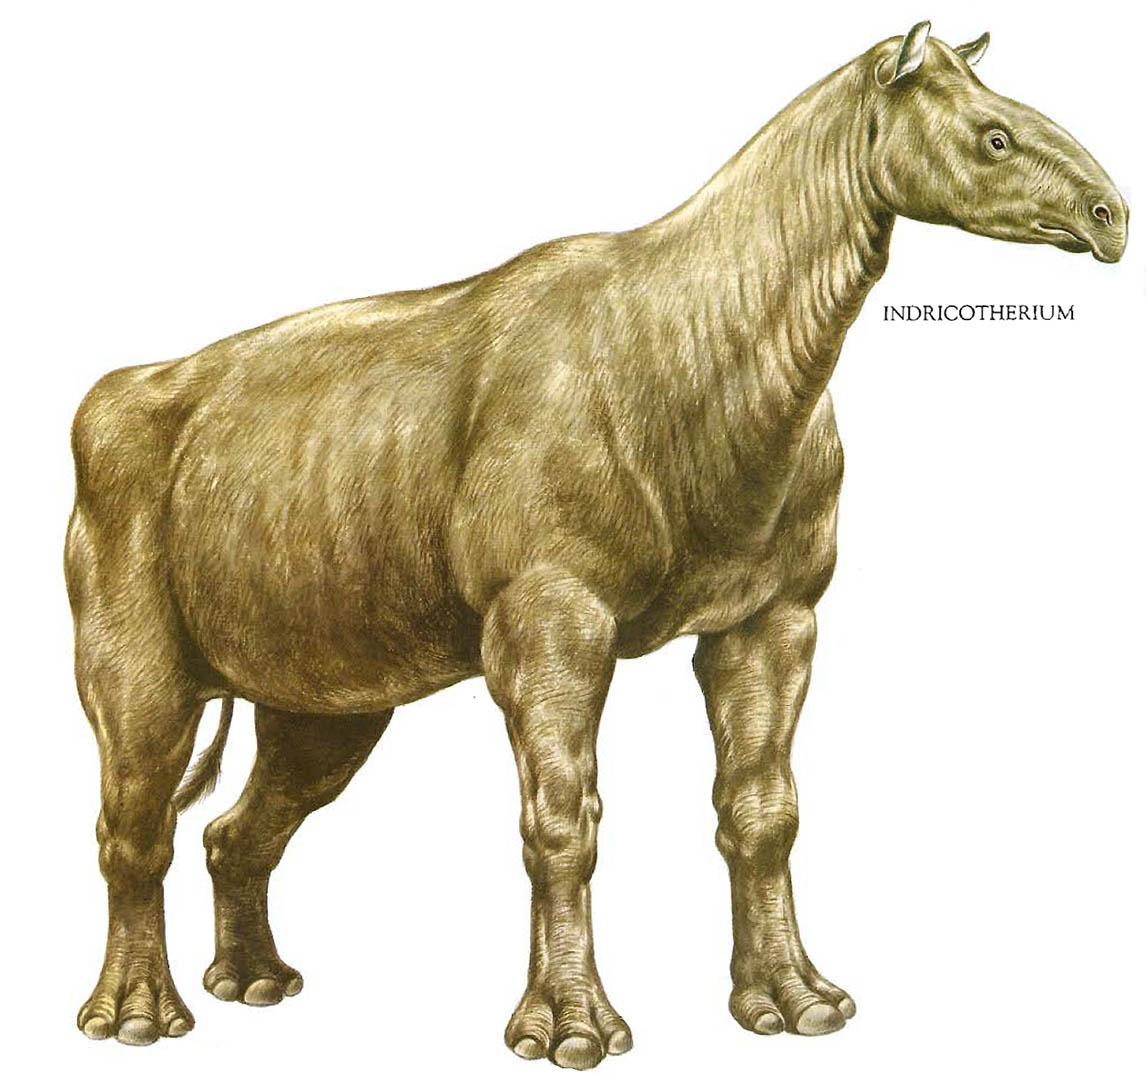 Giant Rhinoceros Indricotherium